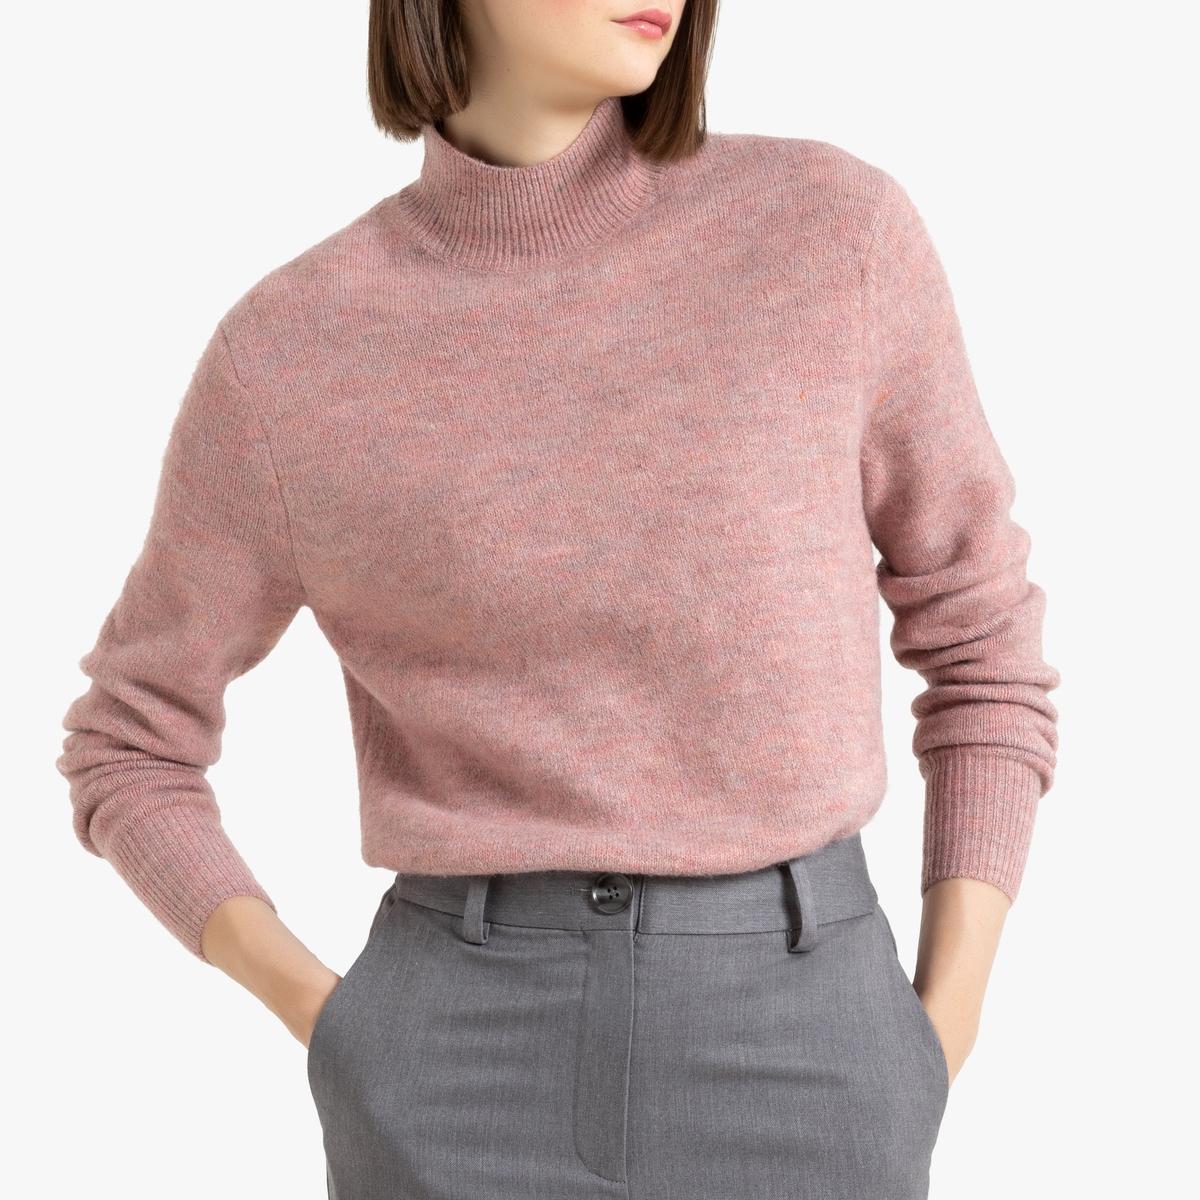 Пуловер La Redoute С воротником-стойкой из трикотажа мулине S розовый кардиган la redoute из трикотажа мулине s розовый